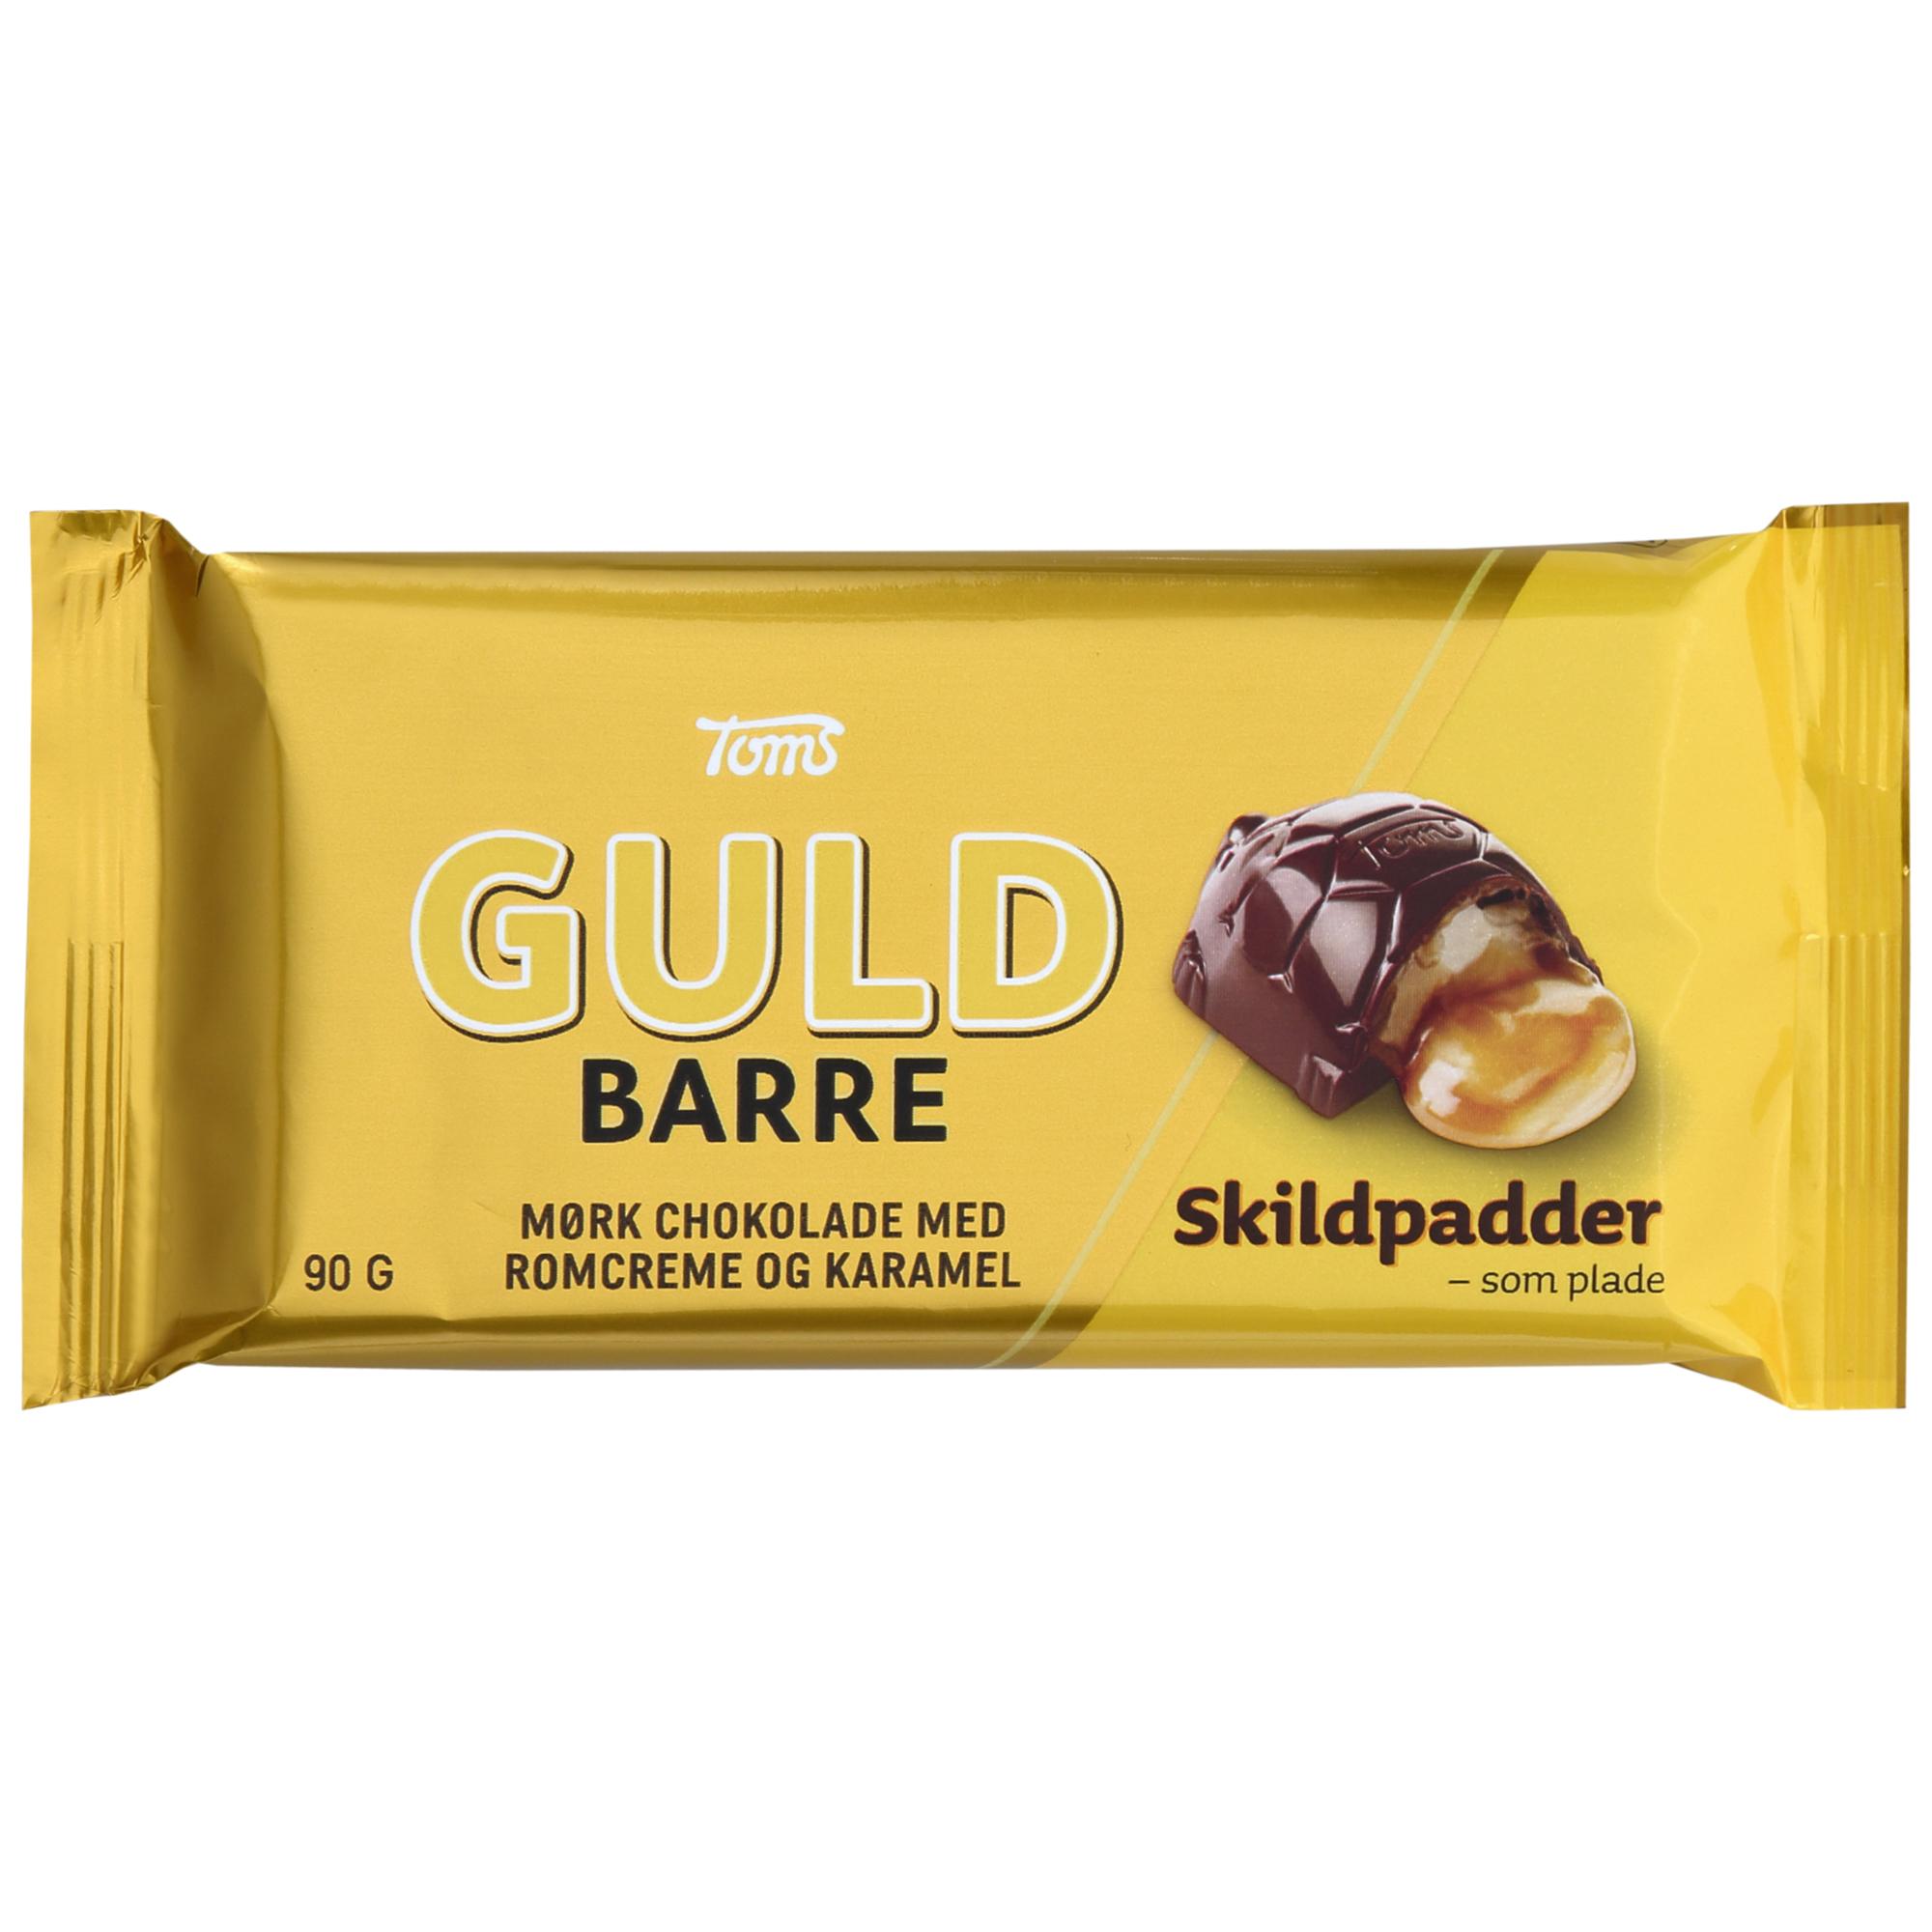 Toms Guld Barre Skildpadder 90g